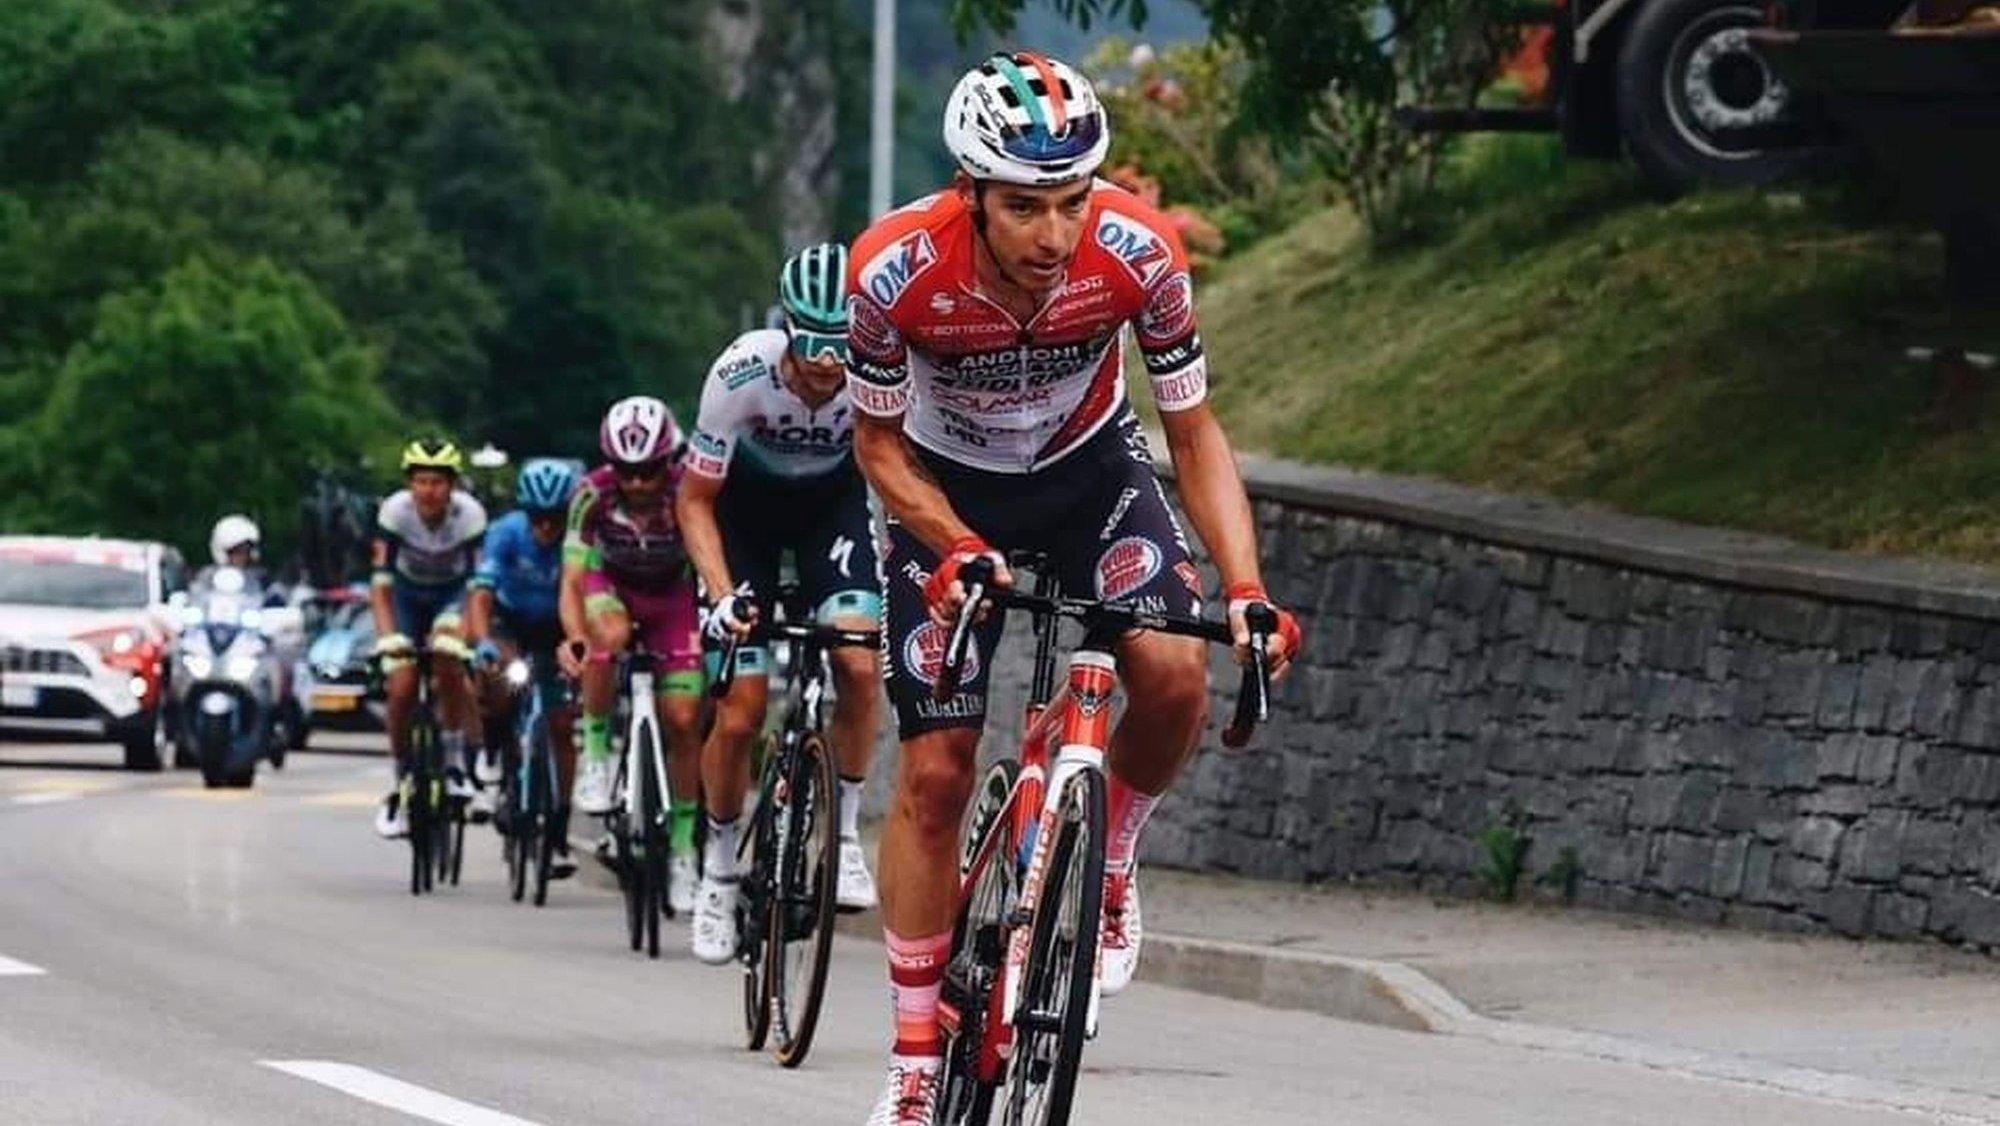 Simon Pellaud quittera Androni Giocattoli en fin de saison pour rejoindre Trek.